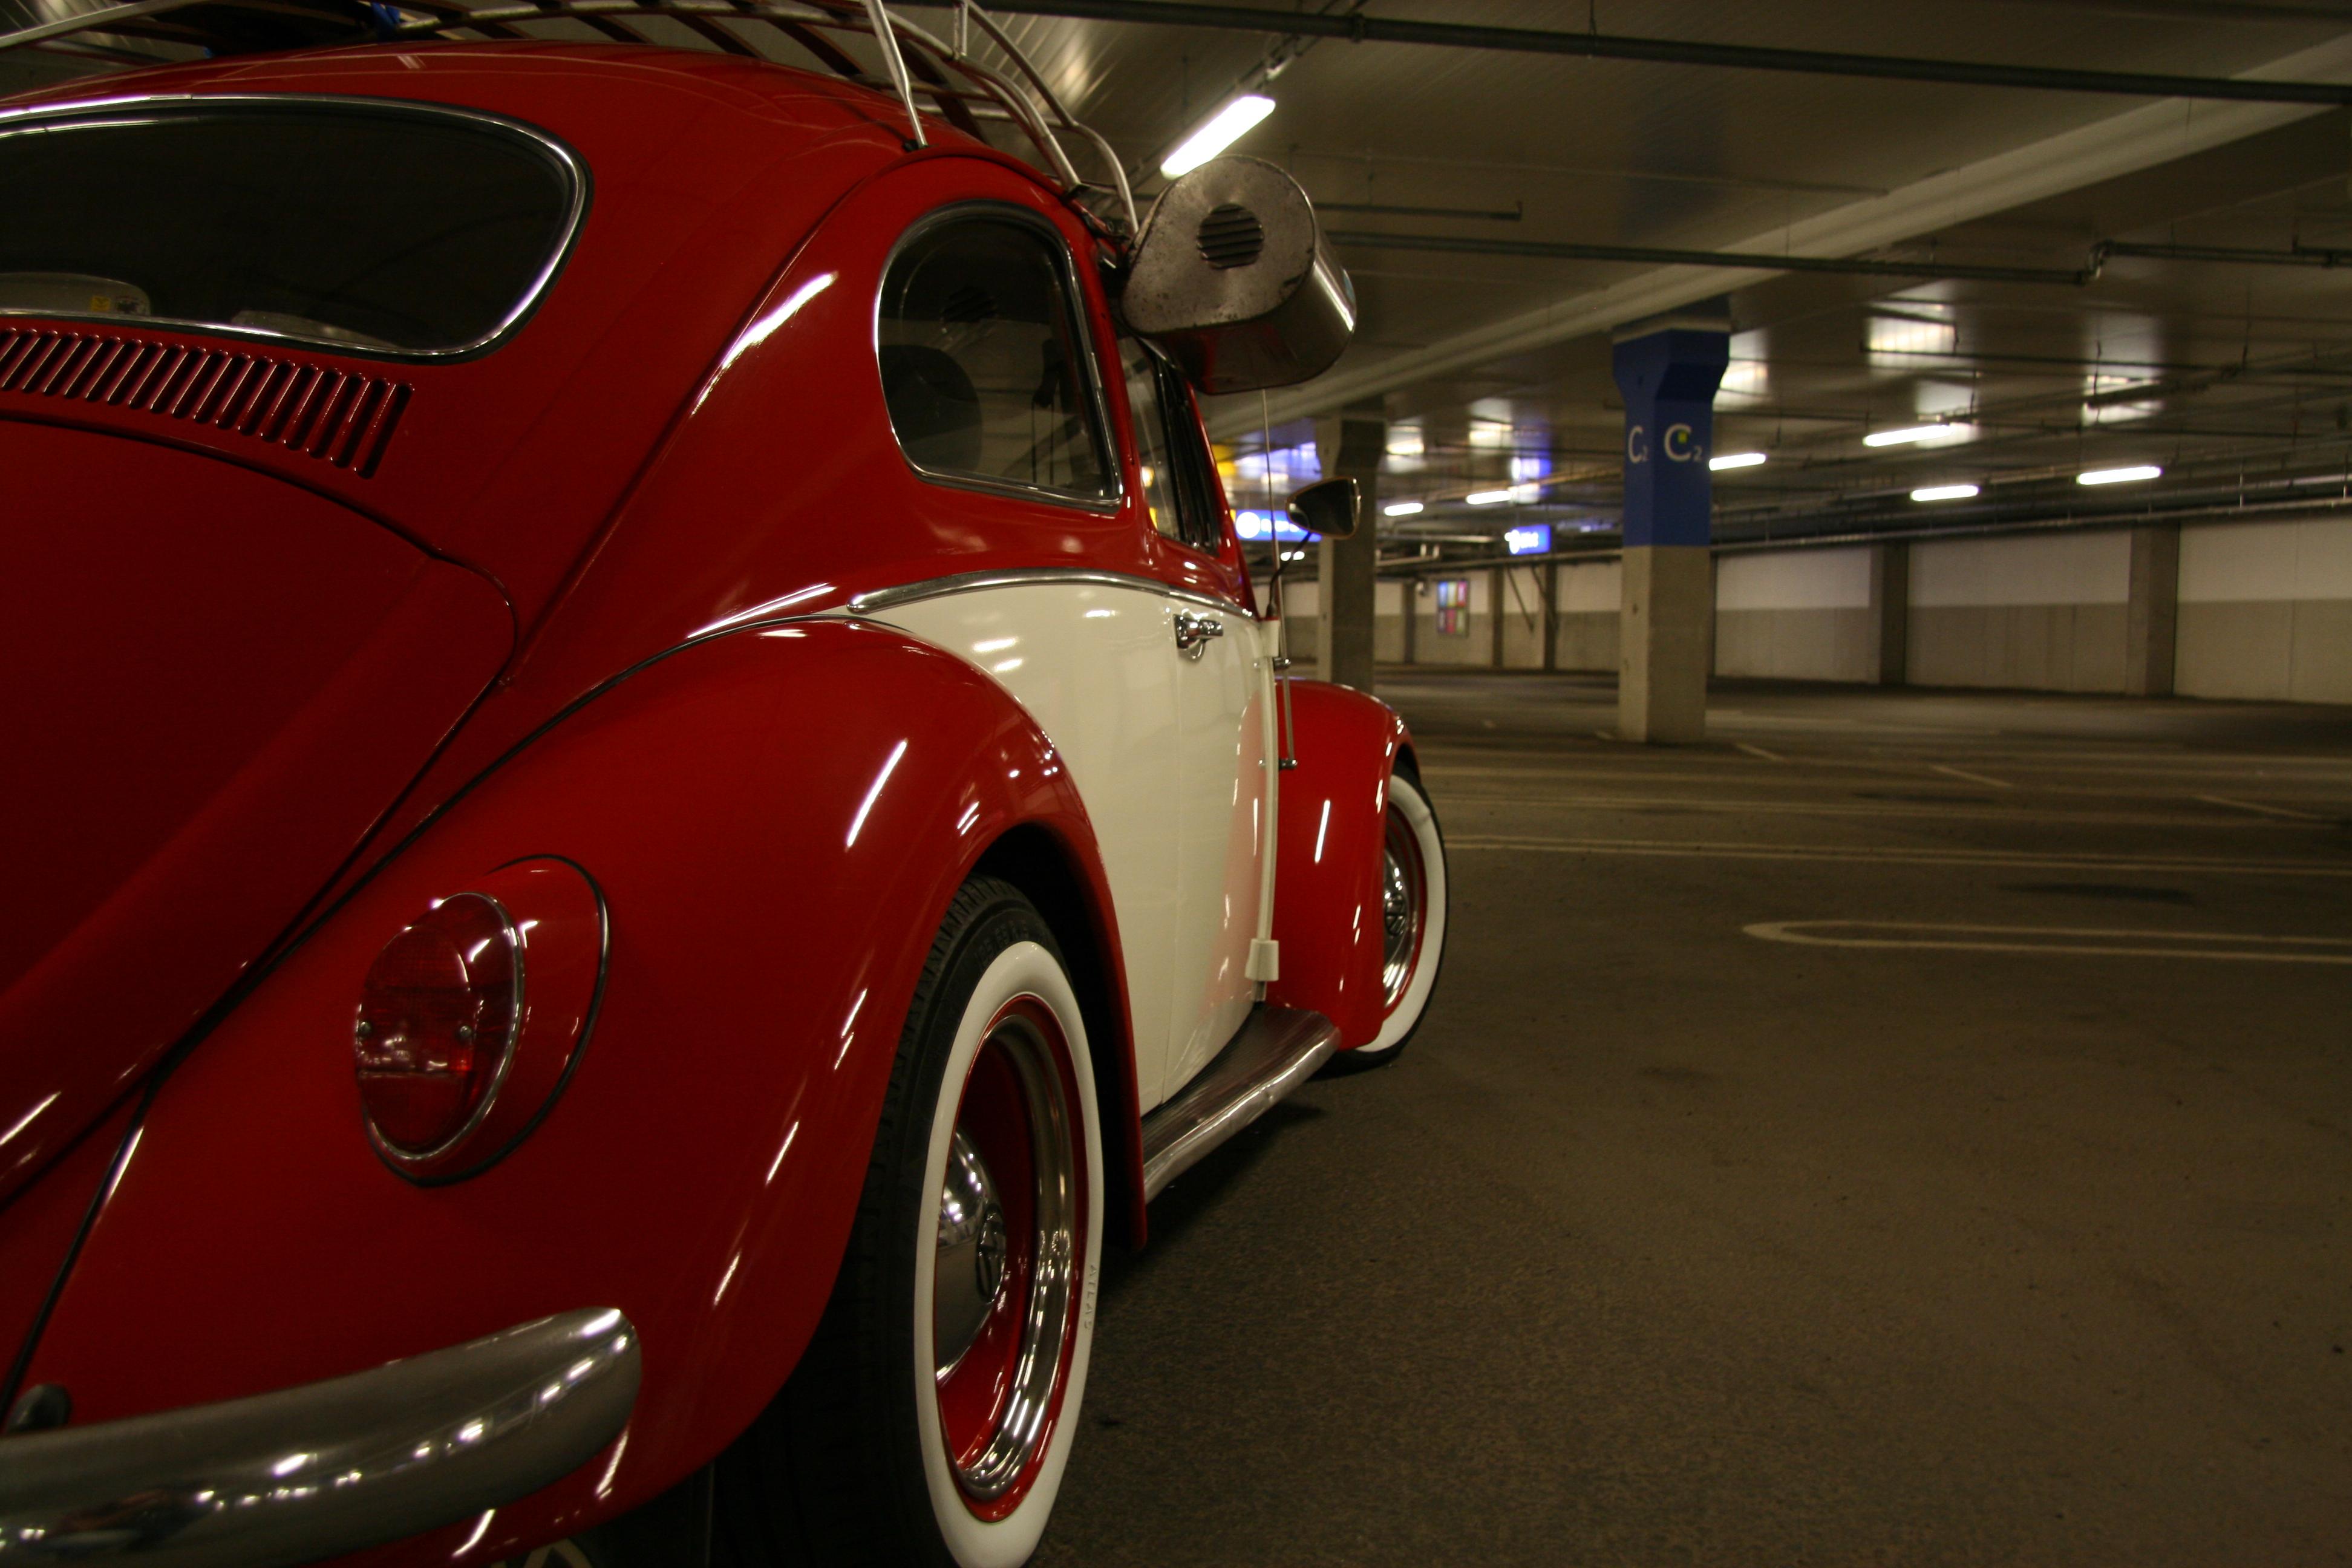 http://mr-nicke.se/stuff/projekt.boxerville/nya%20falgar2012/IMG_6921.JPG